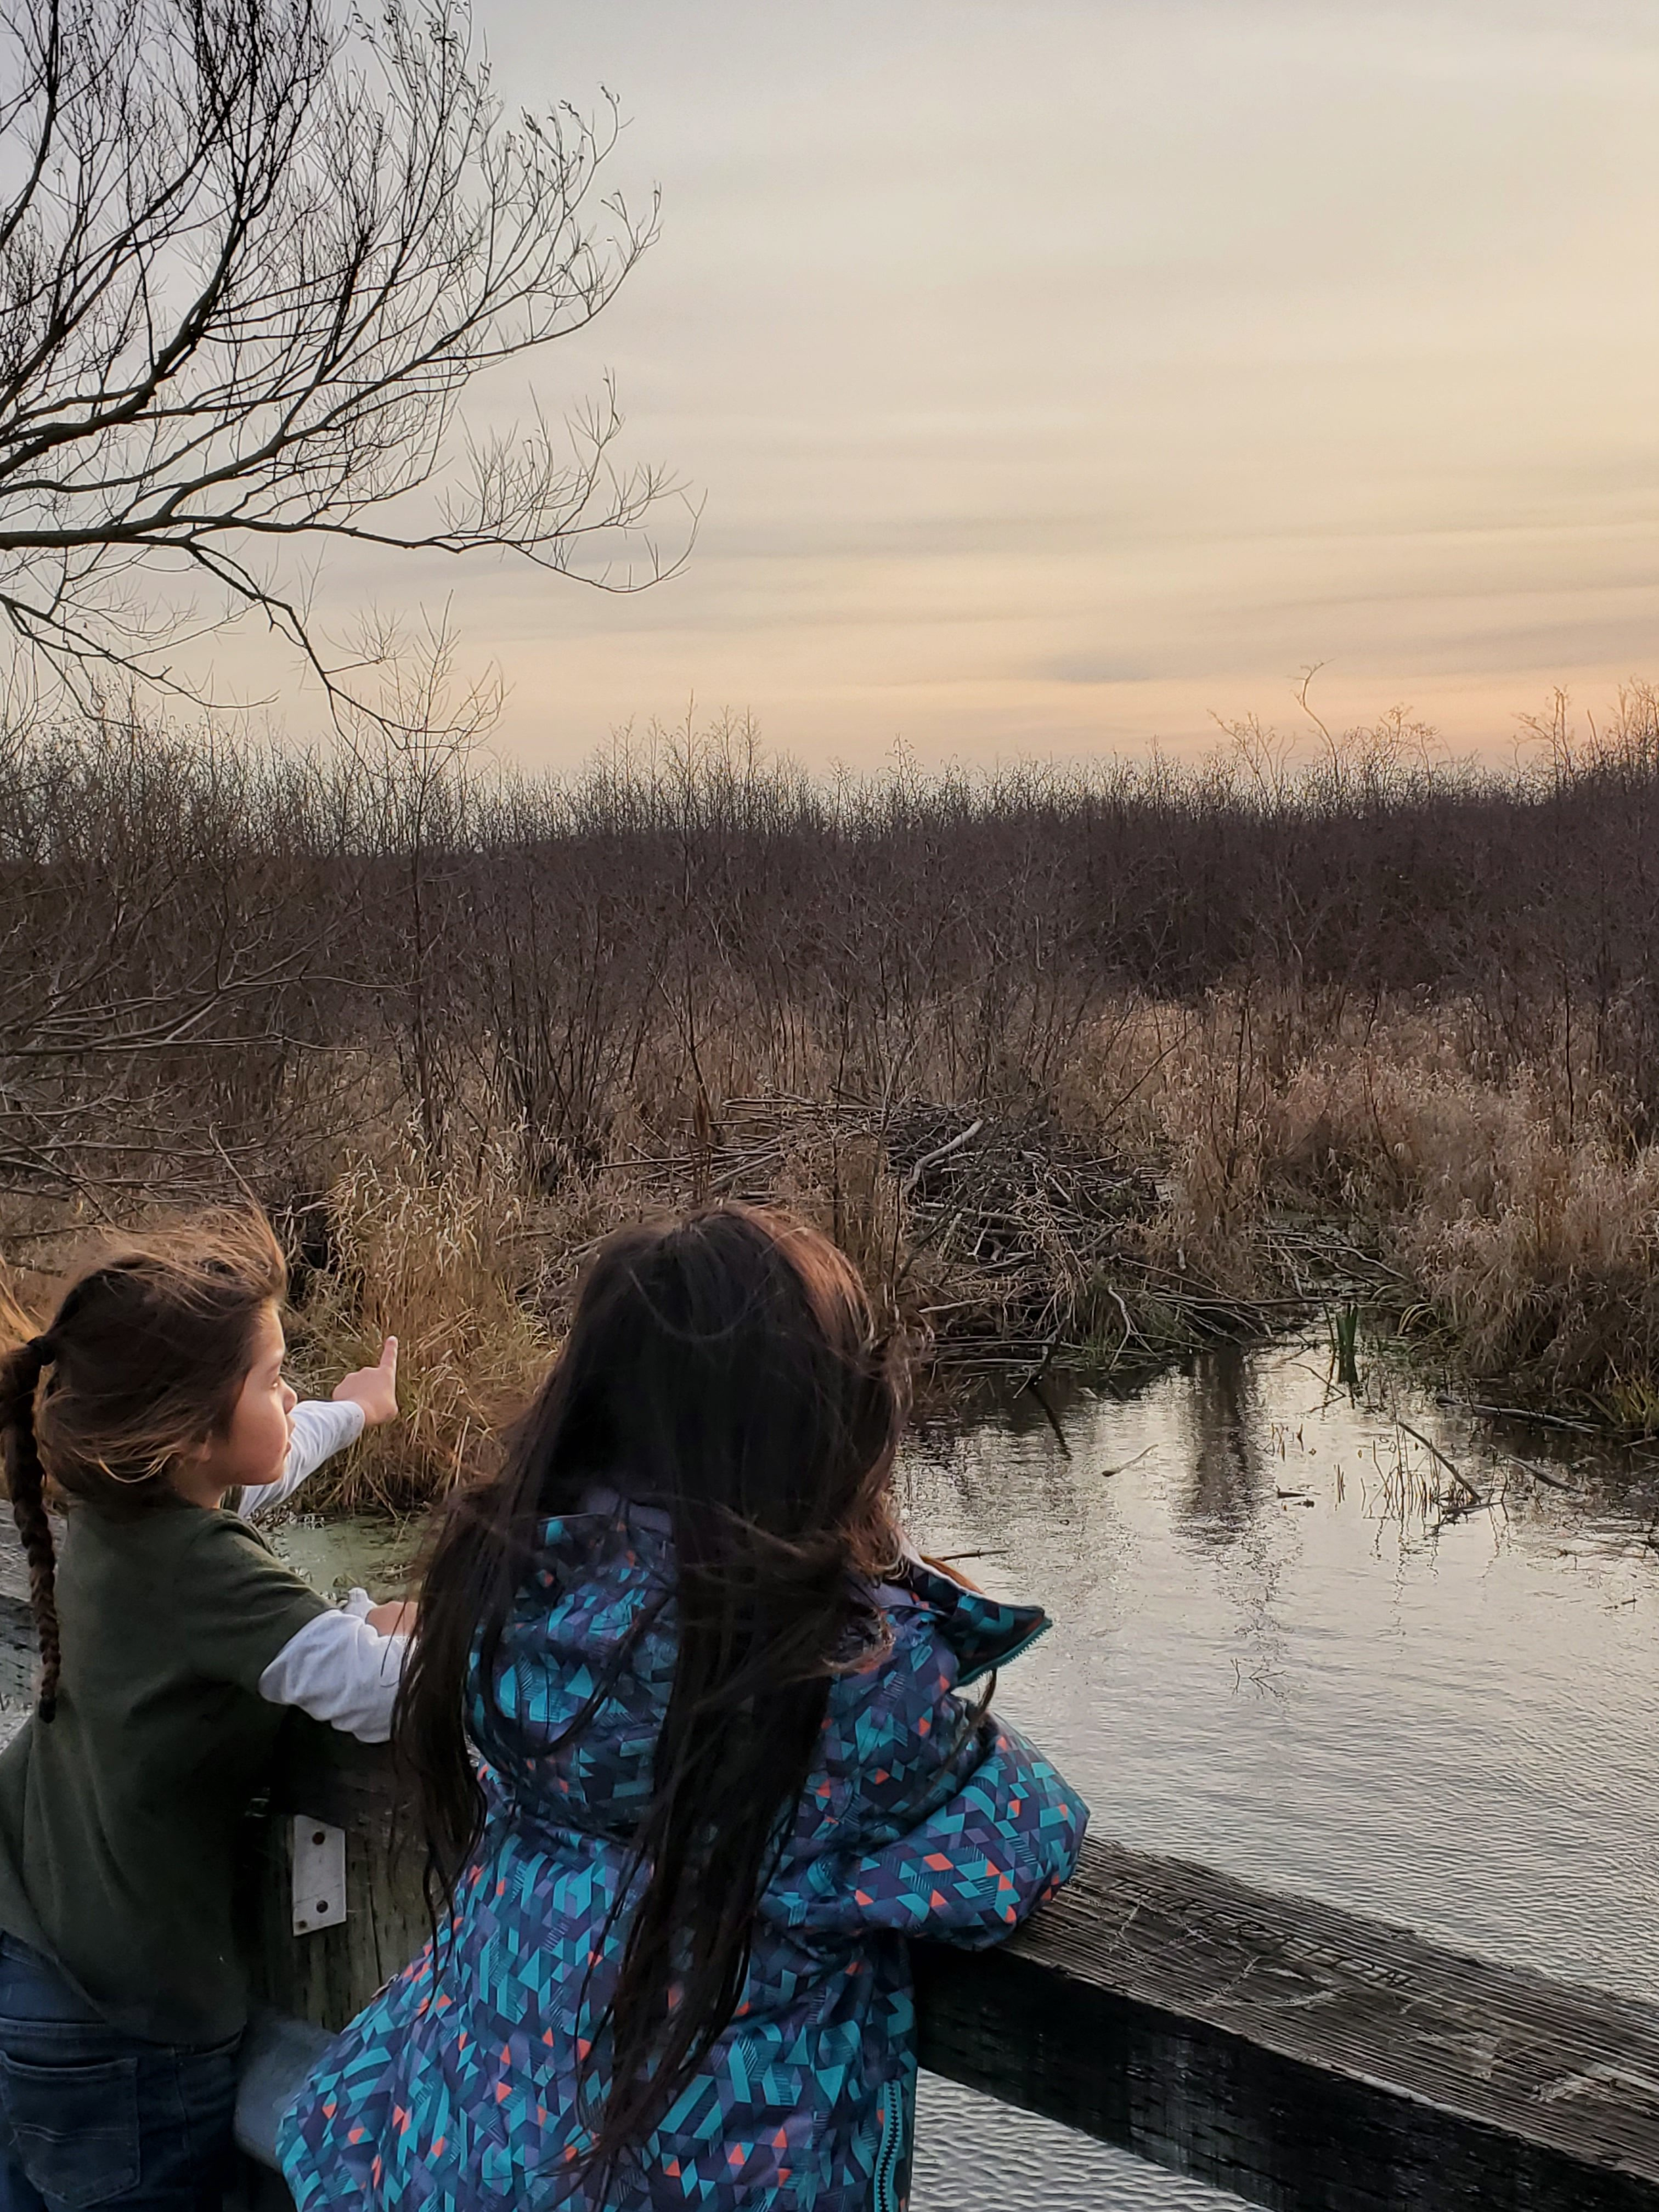 Jaclyn Hall's children Tehaharotaros, 5, and Thahakahteh, 6, overlook a beaver dam along the Pike Creek near the Kanien'kehá:ka land back language camp. (Submitted by Jaclyn Hall)